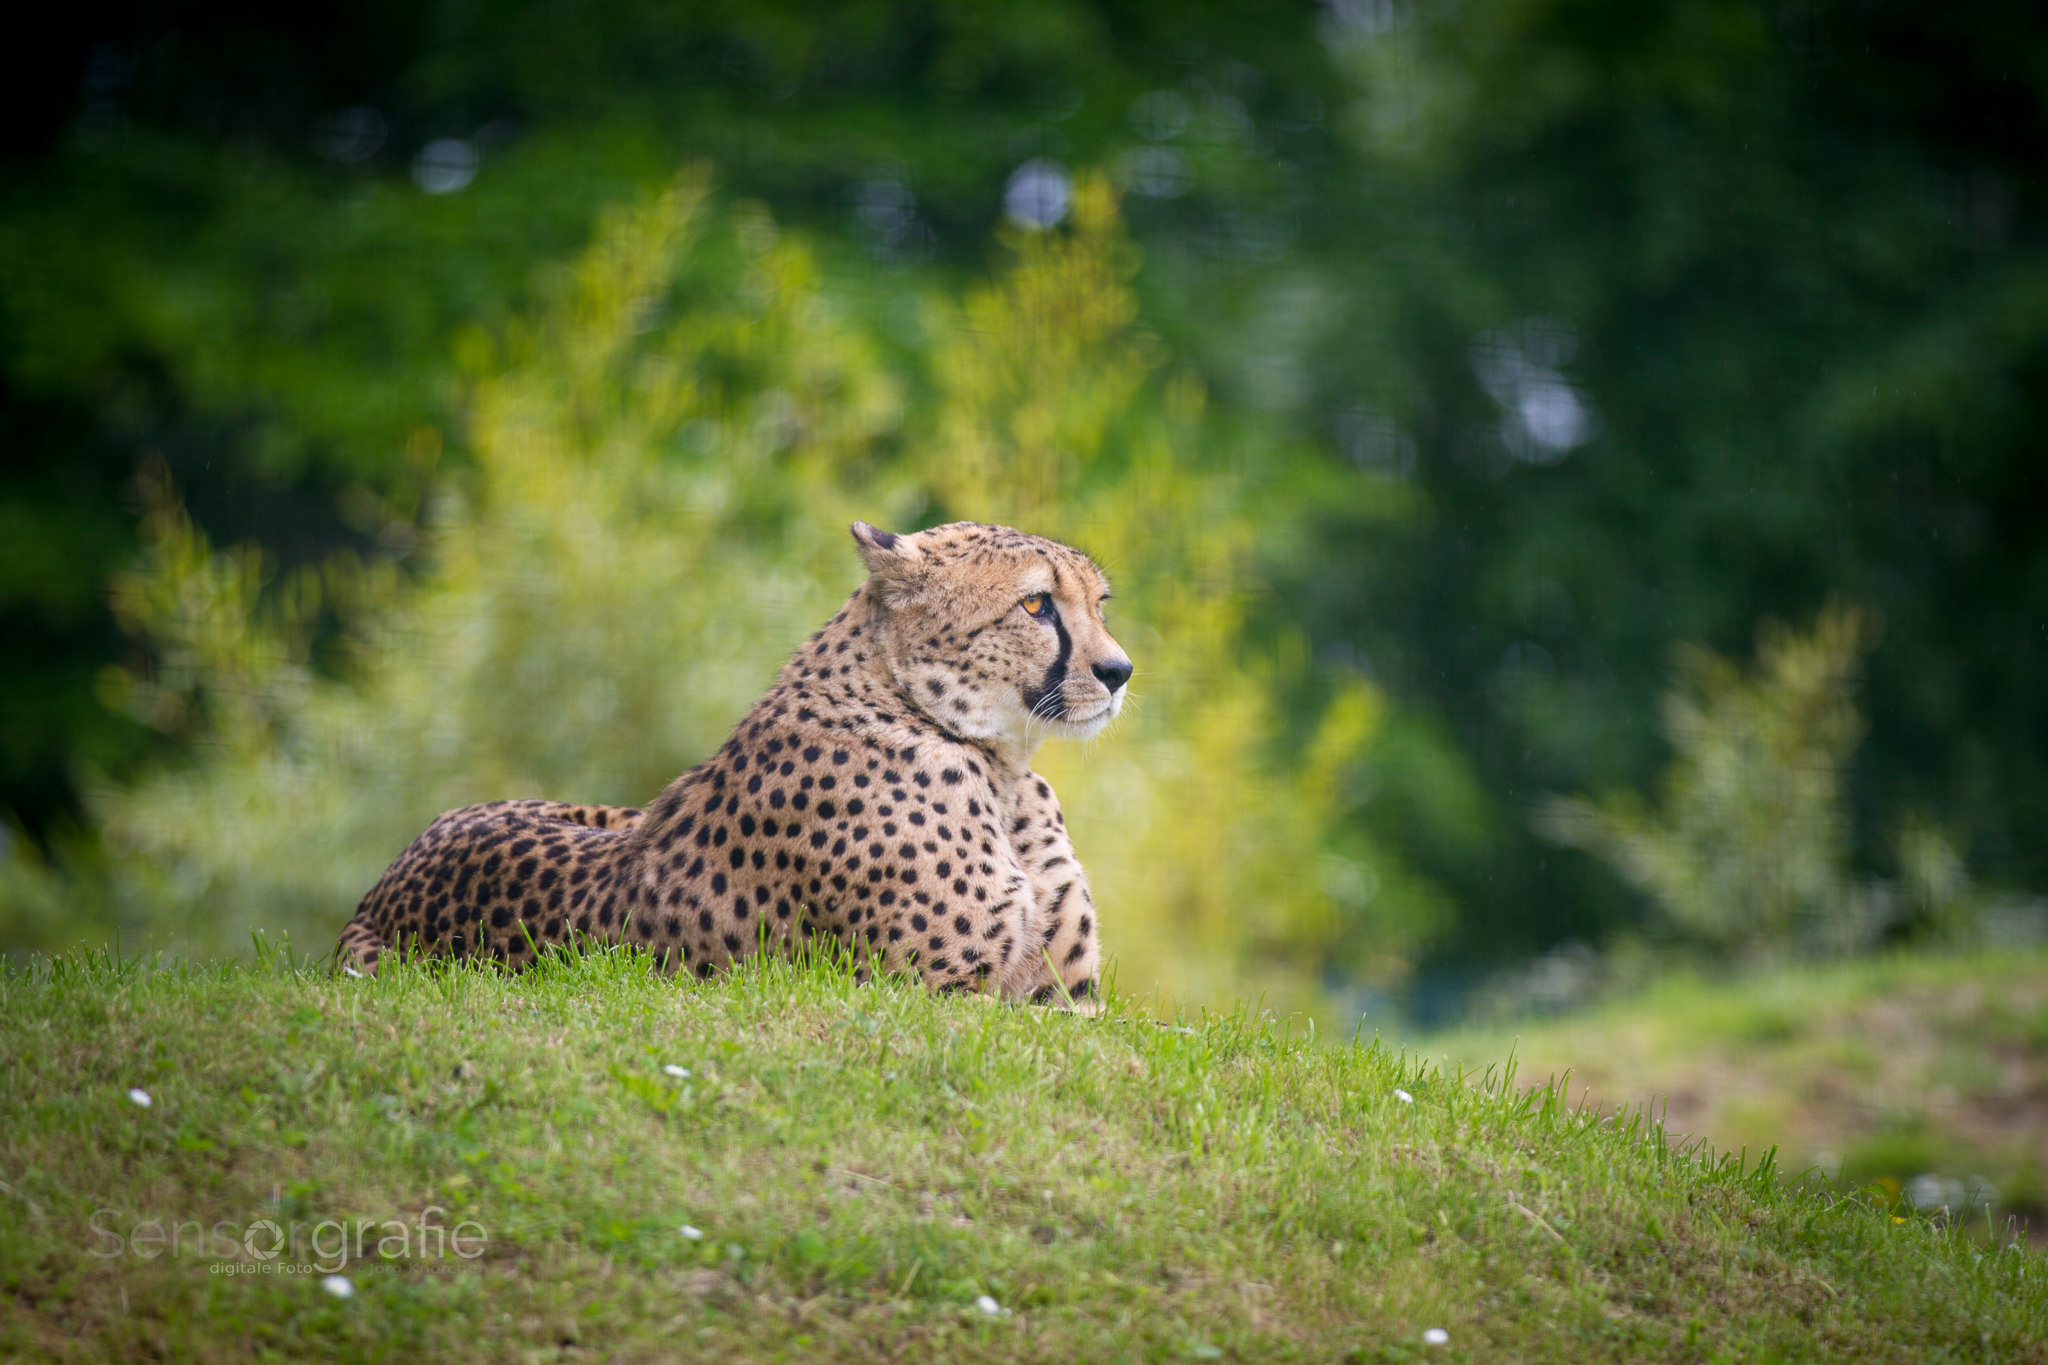 Tierfotografie (EuregioZOO)